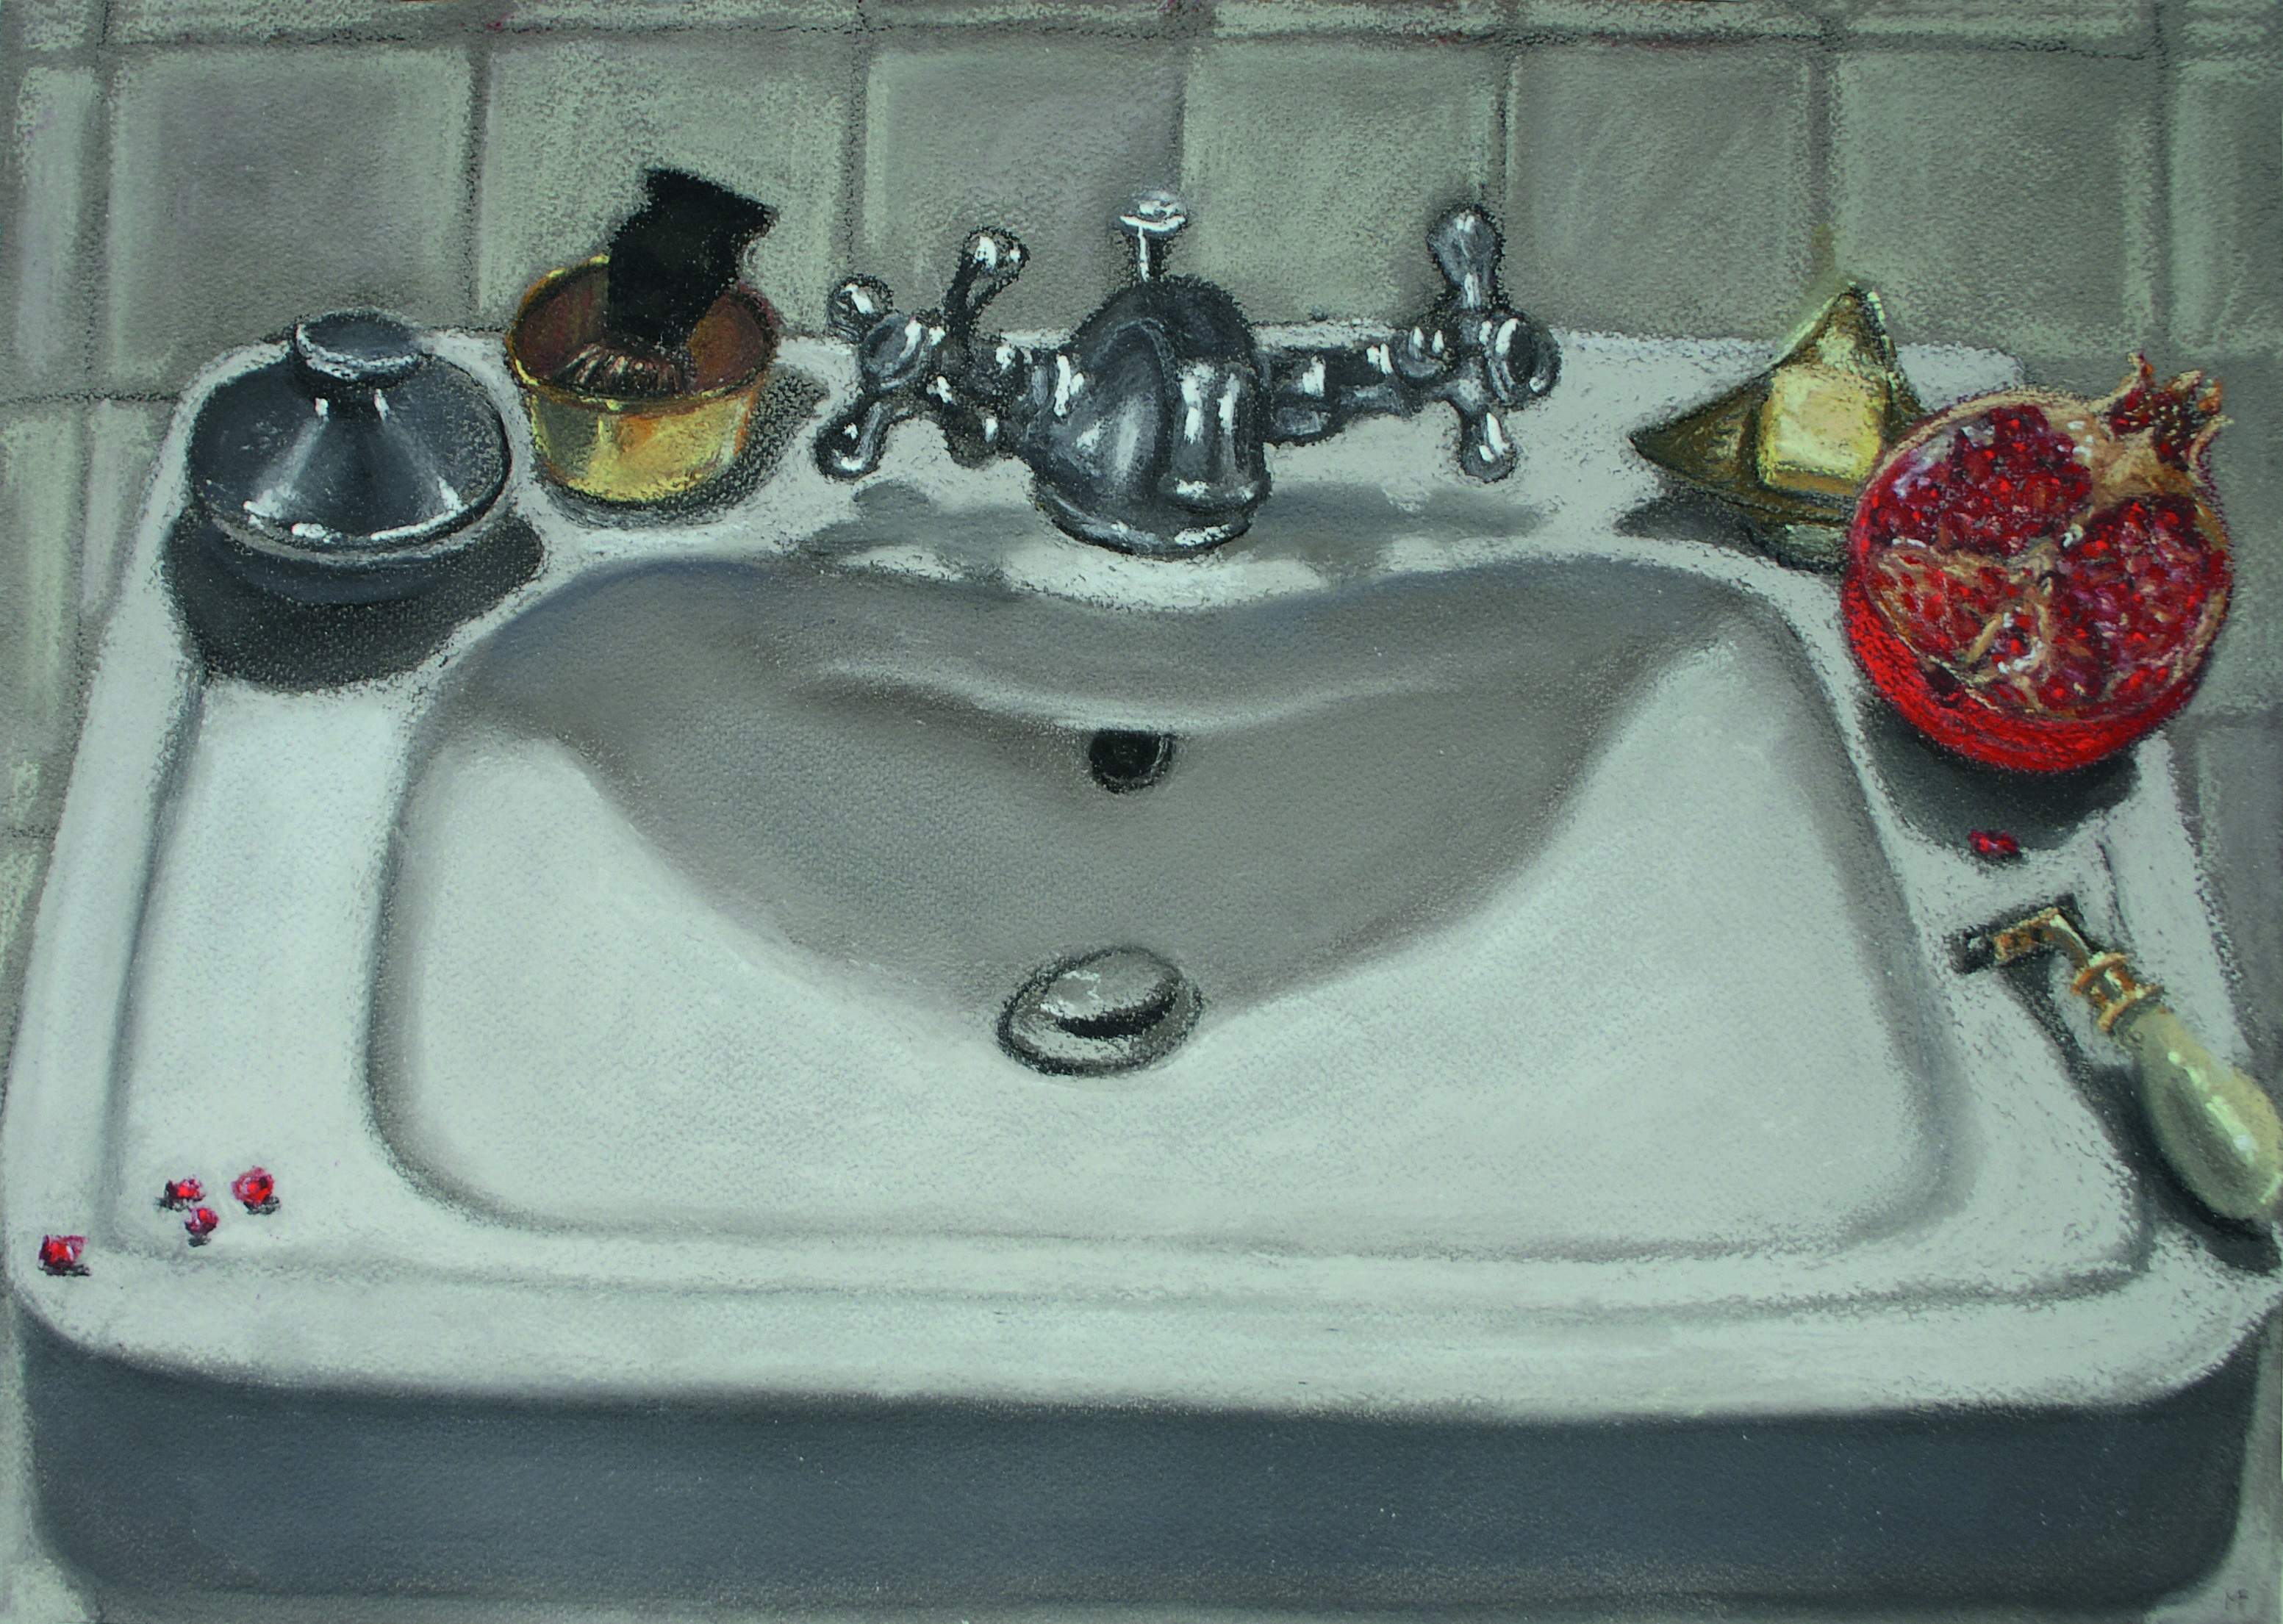 B 15)Lavabo, 2010, pastello su carta Ingres, cm 35 x 50